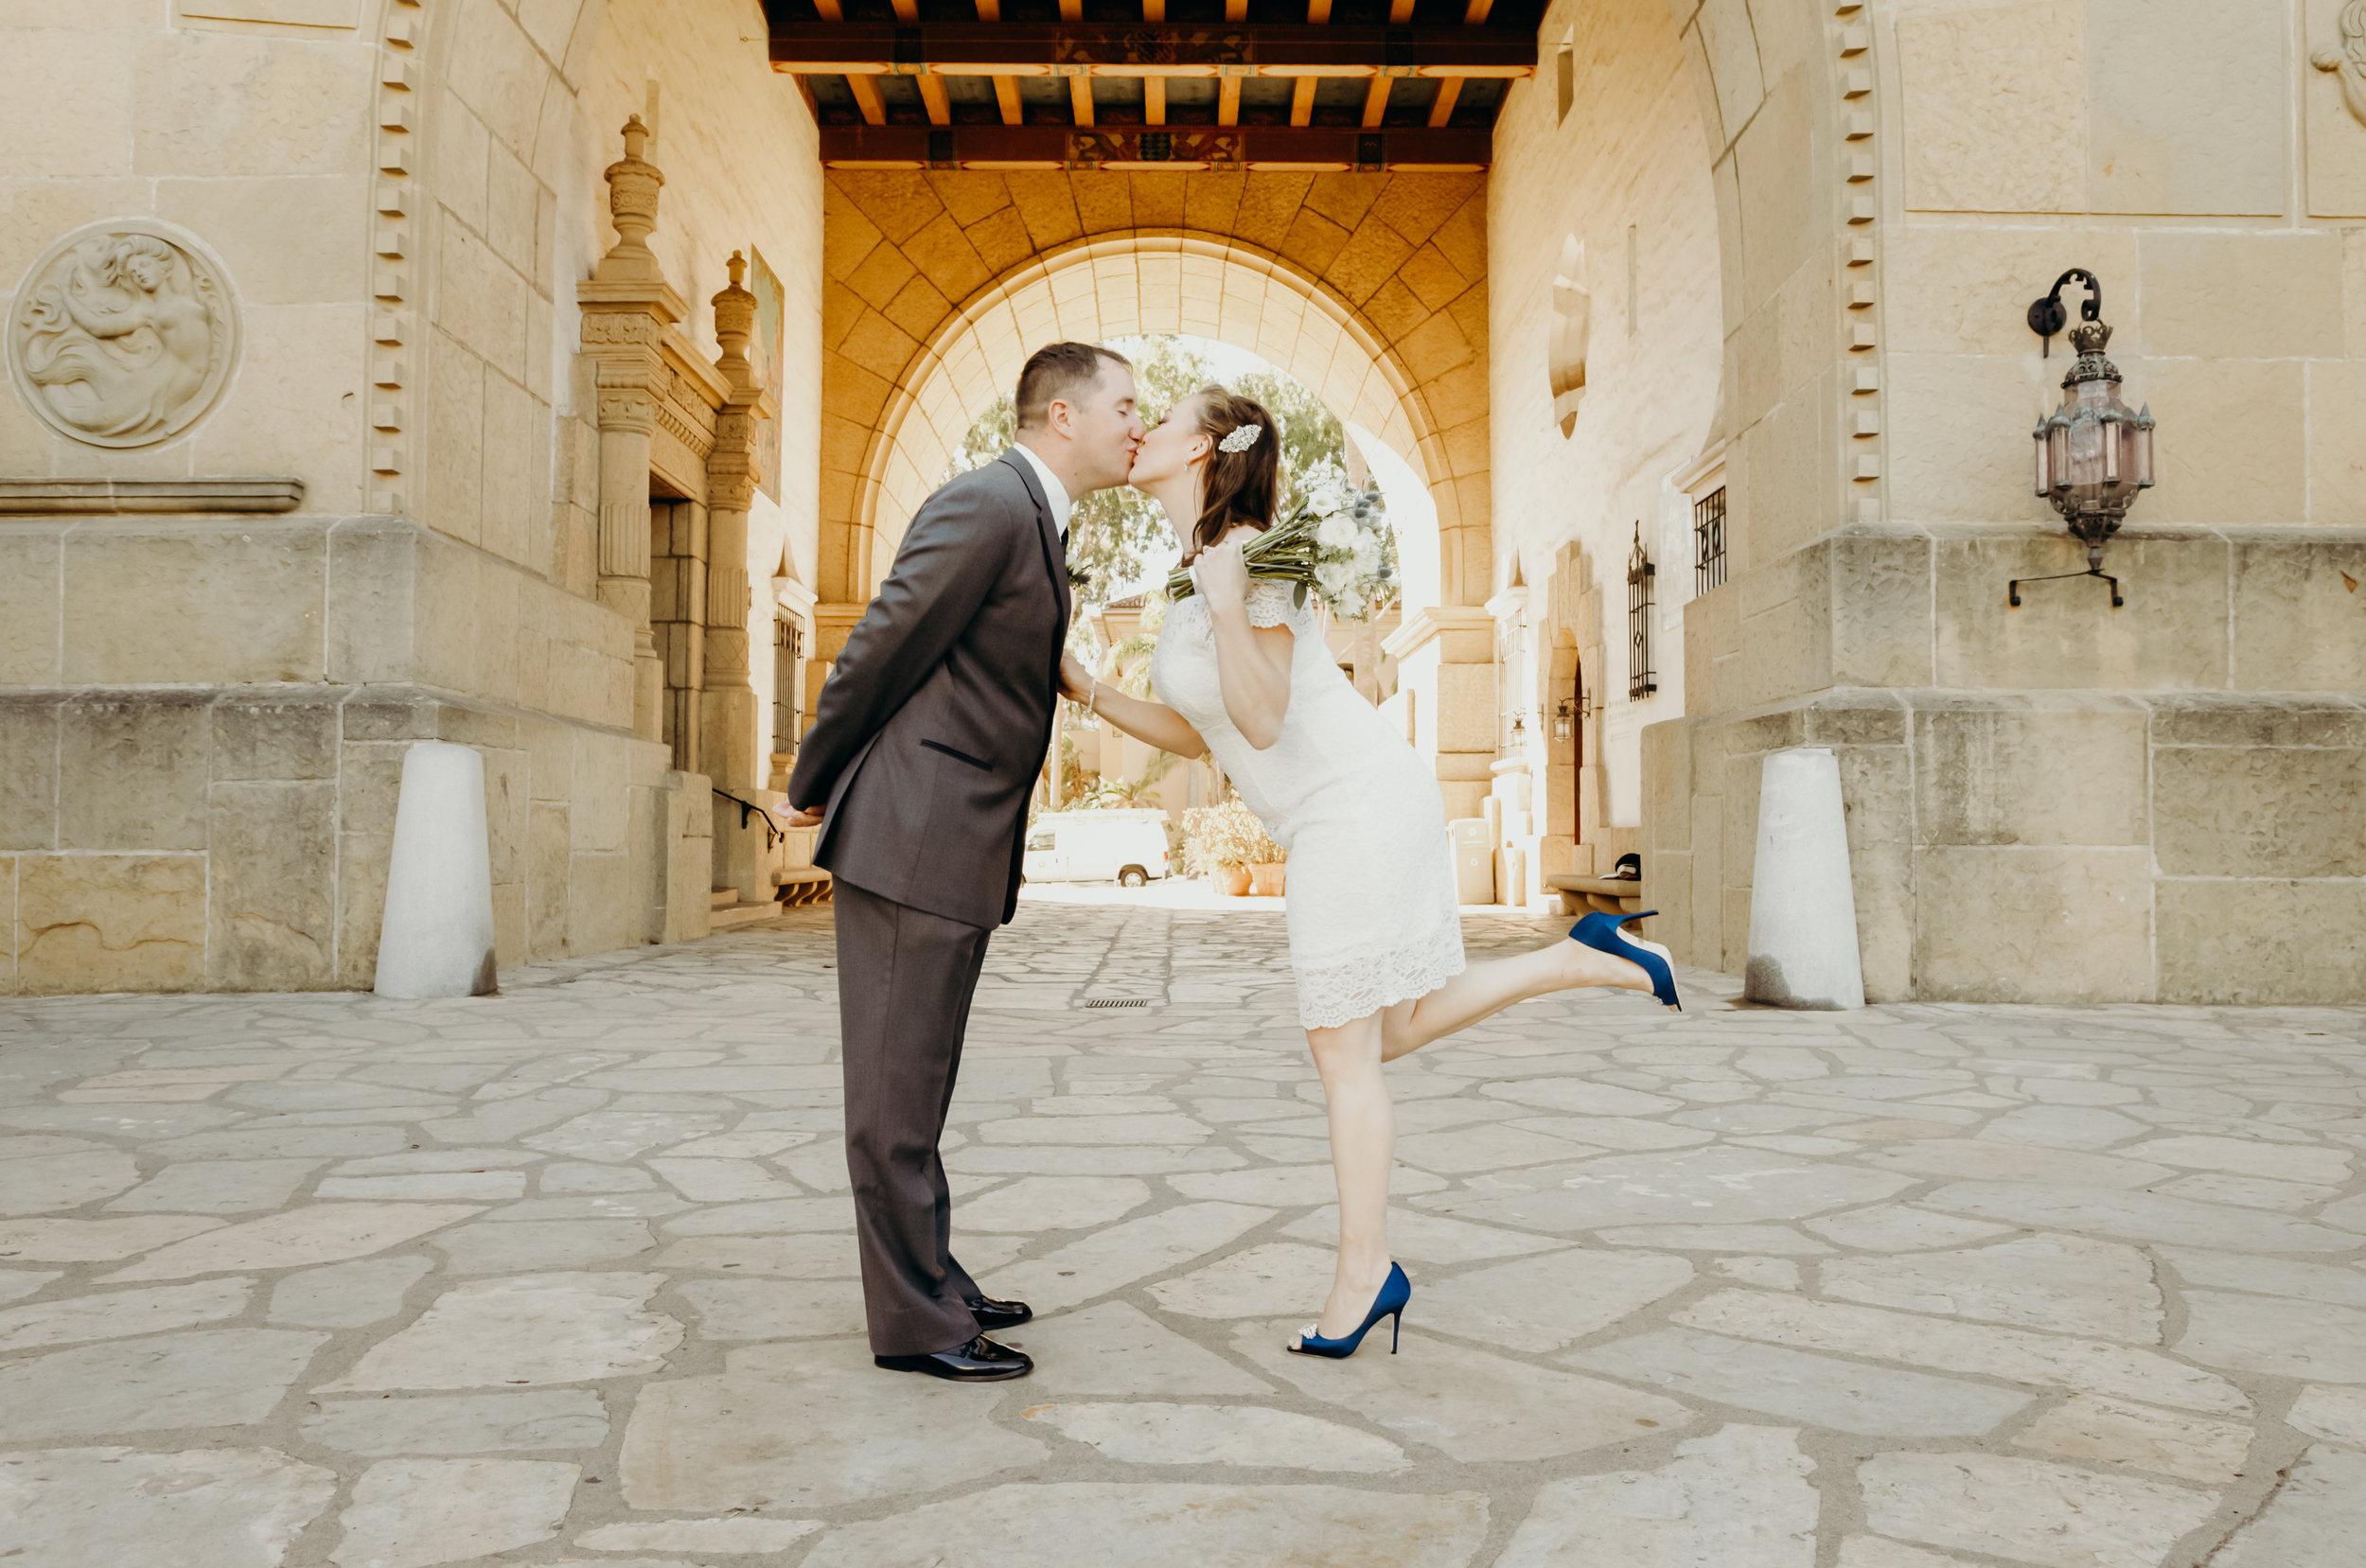 Gianna Keiko Atlanta Destination Wedding Elopement Photographer-16.jpg